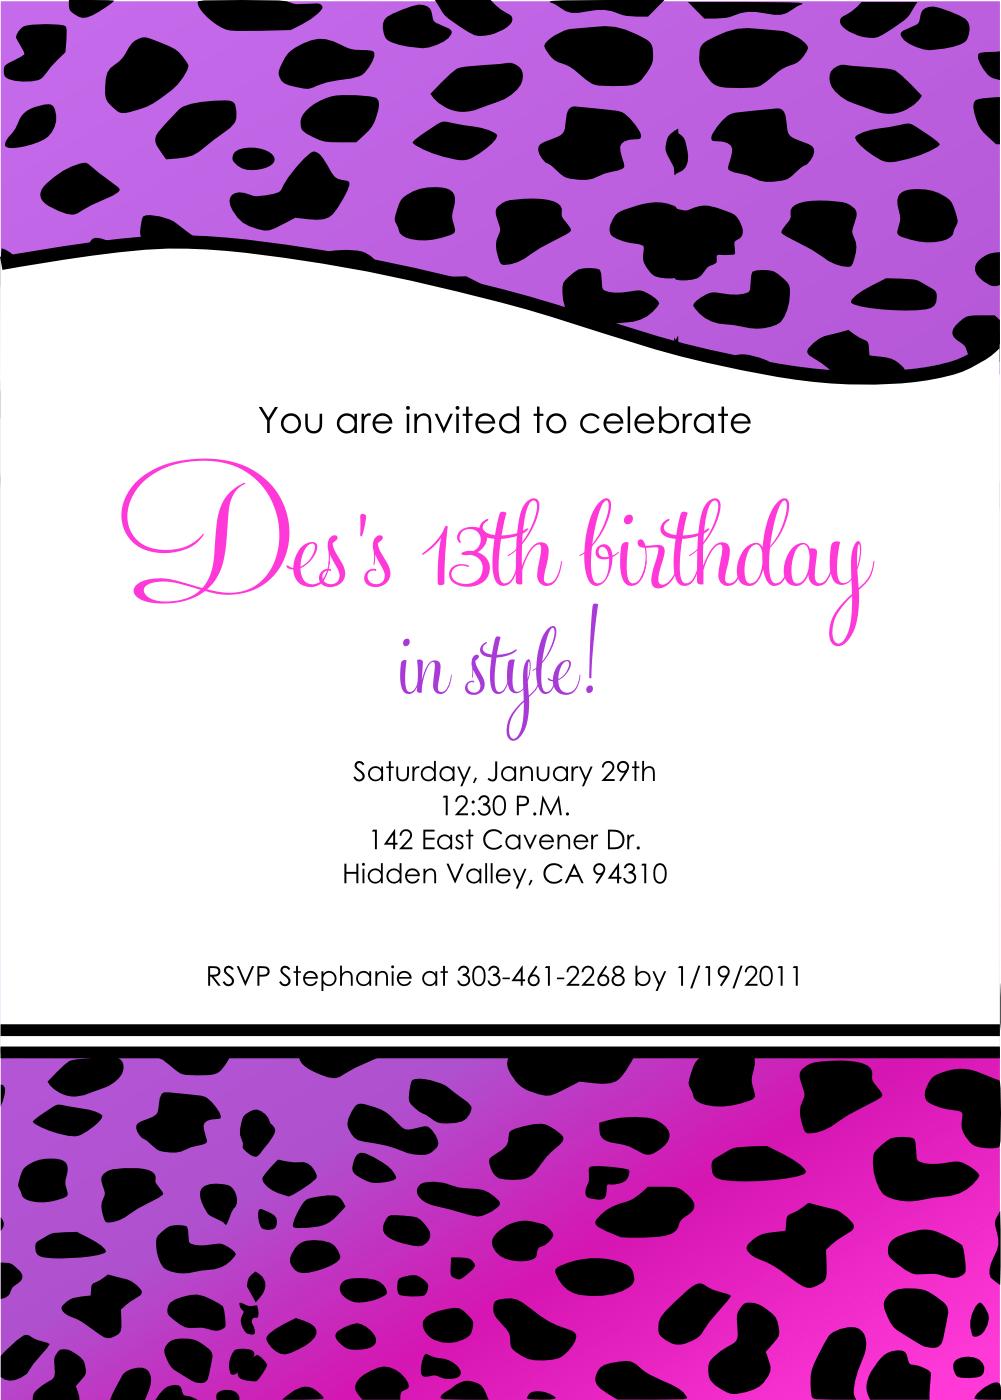 12th Birthday Party Invitations - Mickey Mouse Invitations Templates